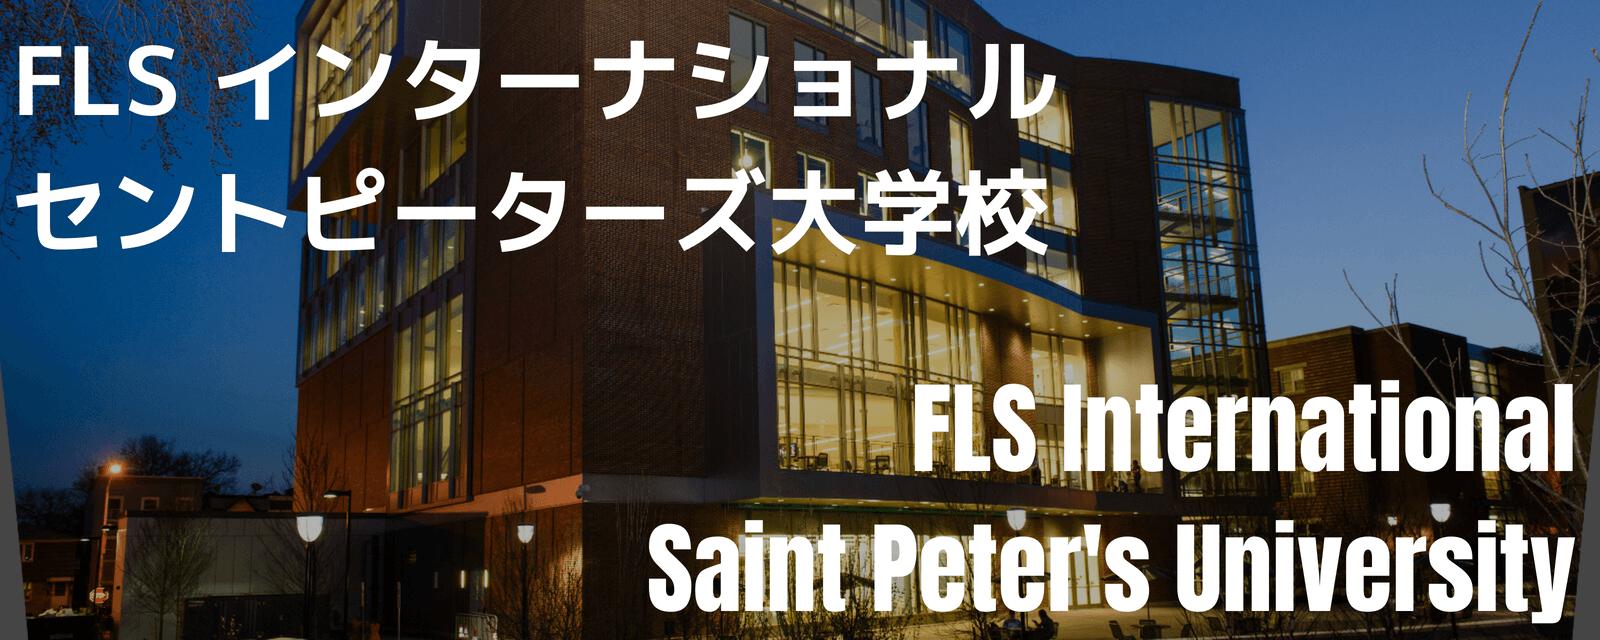 FLS International Saint Peter's University